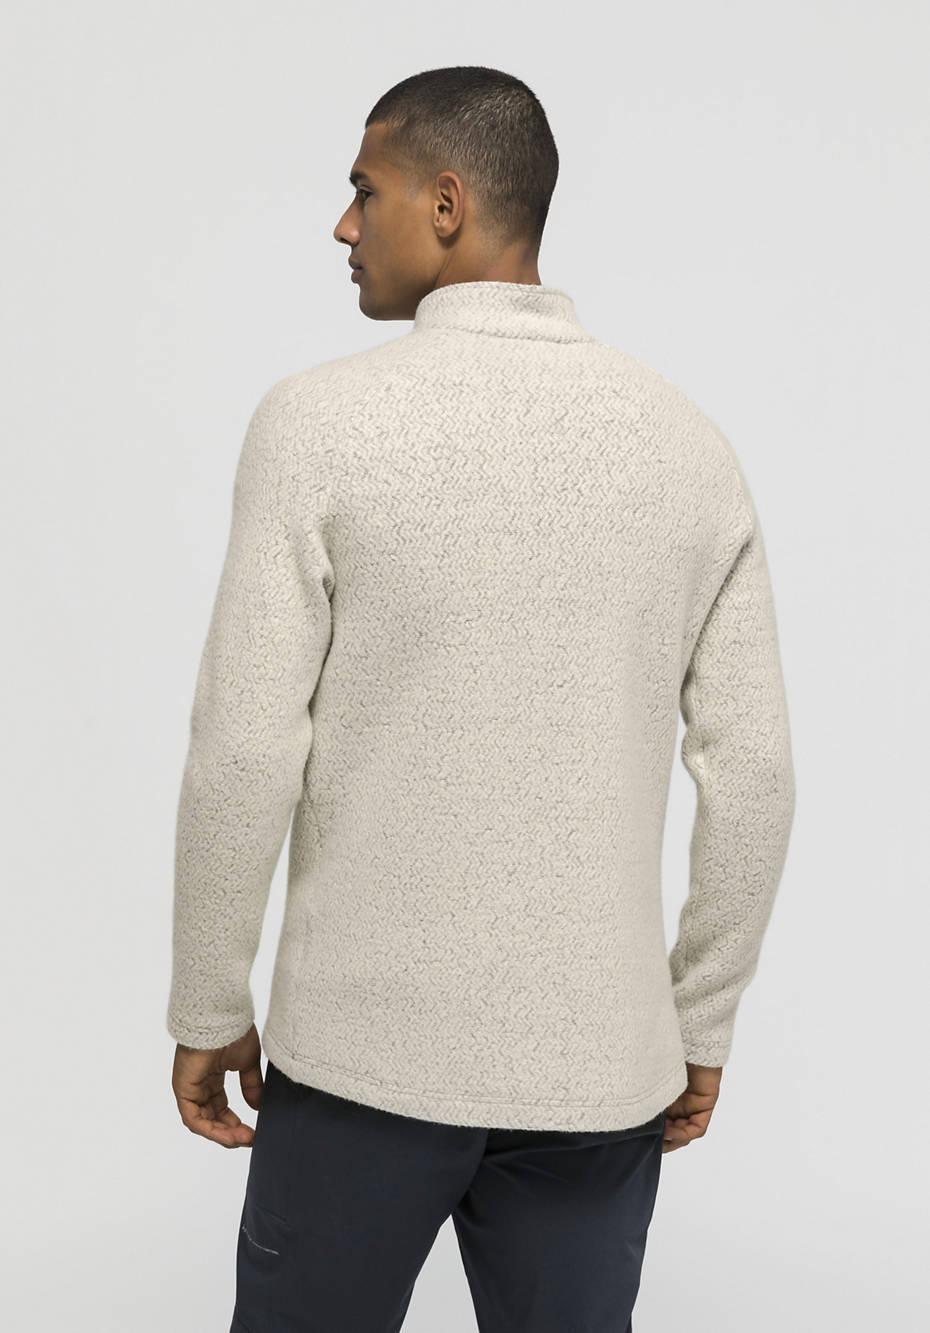 Fleece troyer made of organic merino wool and organic cotton